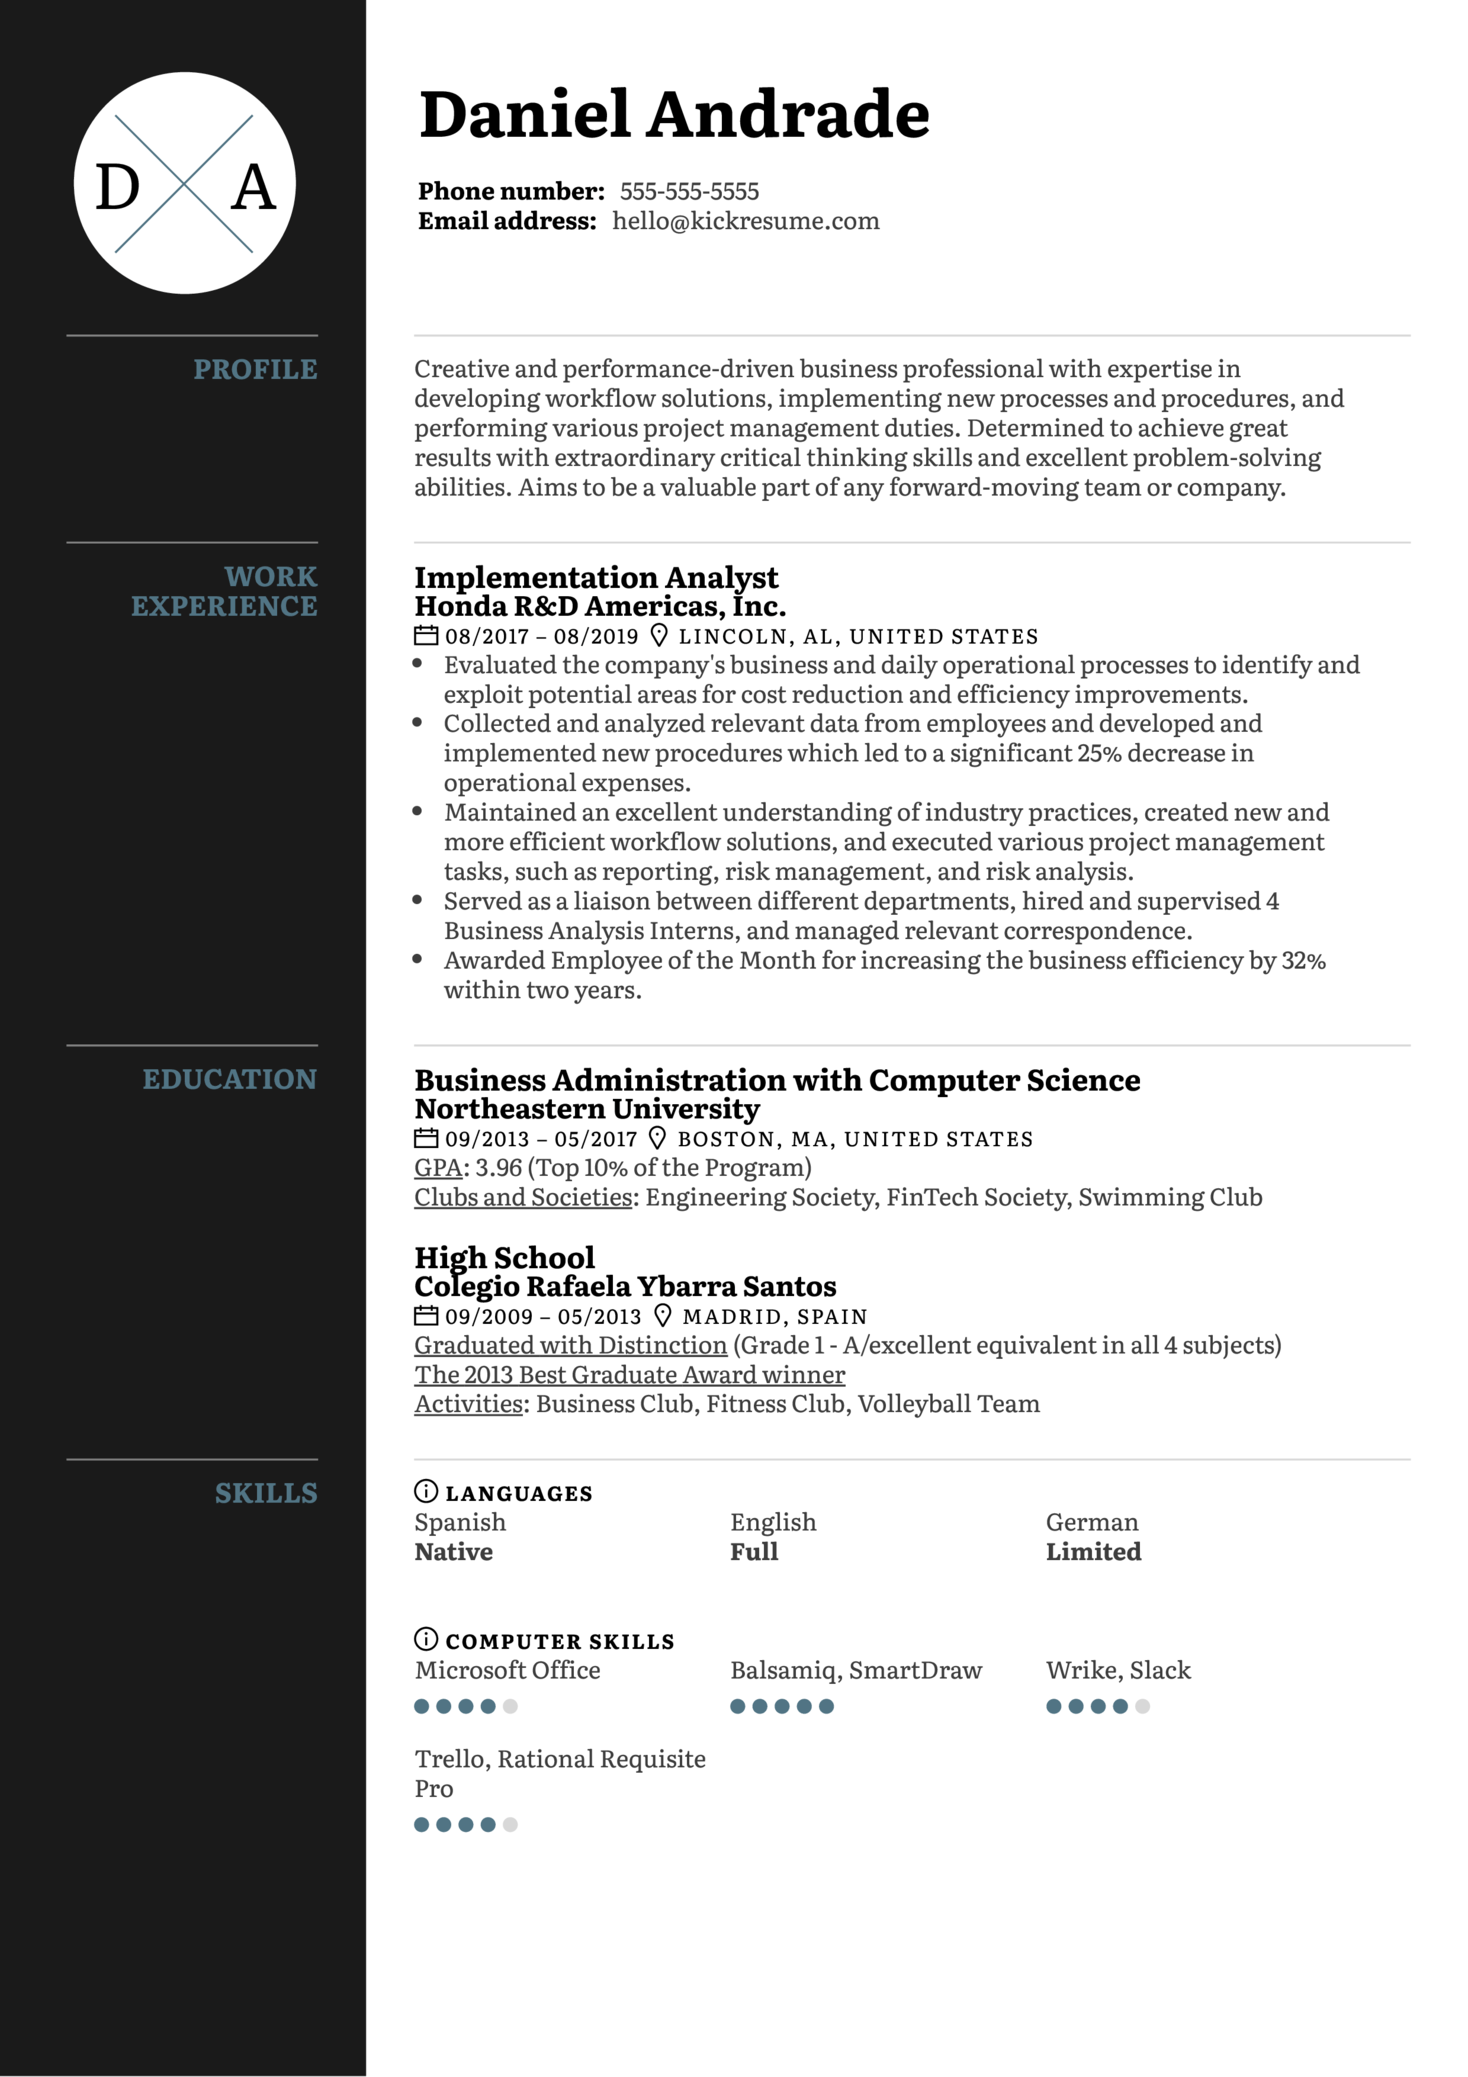 Implementation Analyst Resume Sample (Part 1)